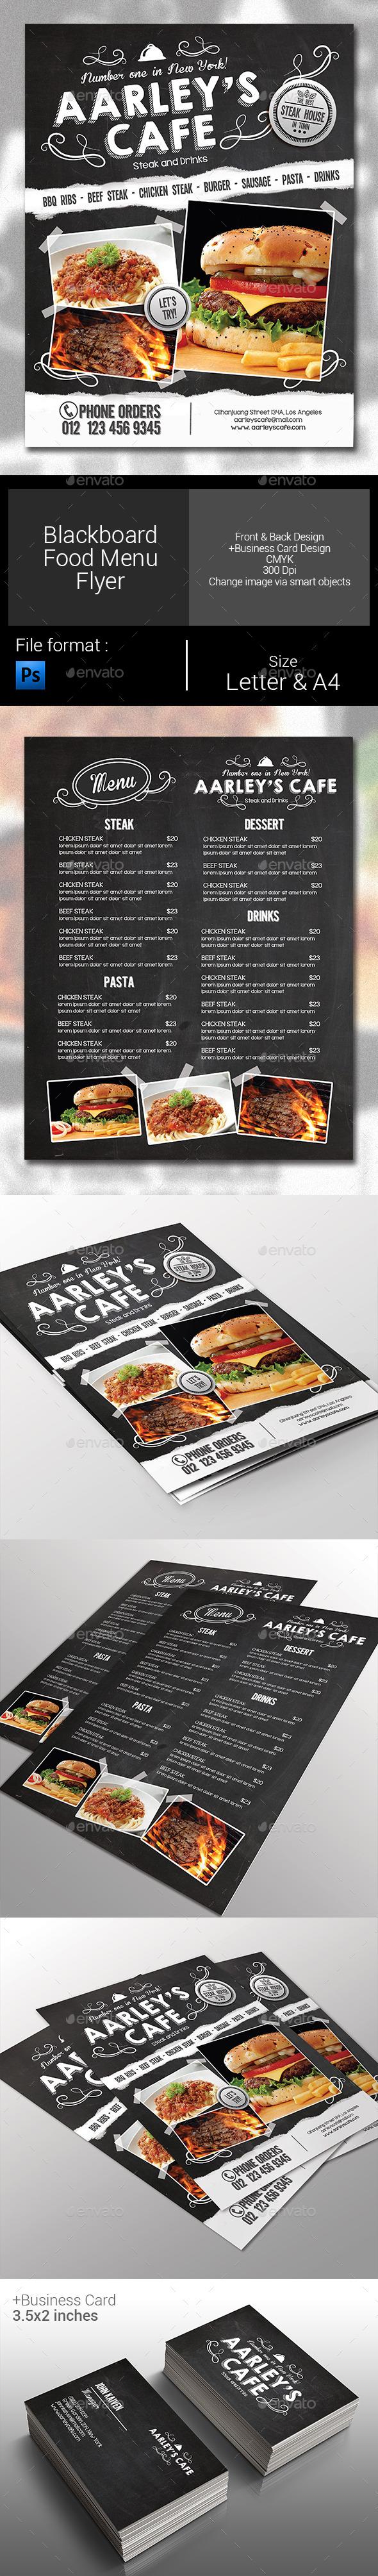 GraphicRiver Blackboard Menu Flyer 10179154